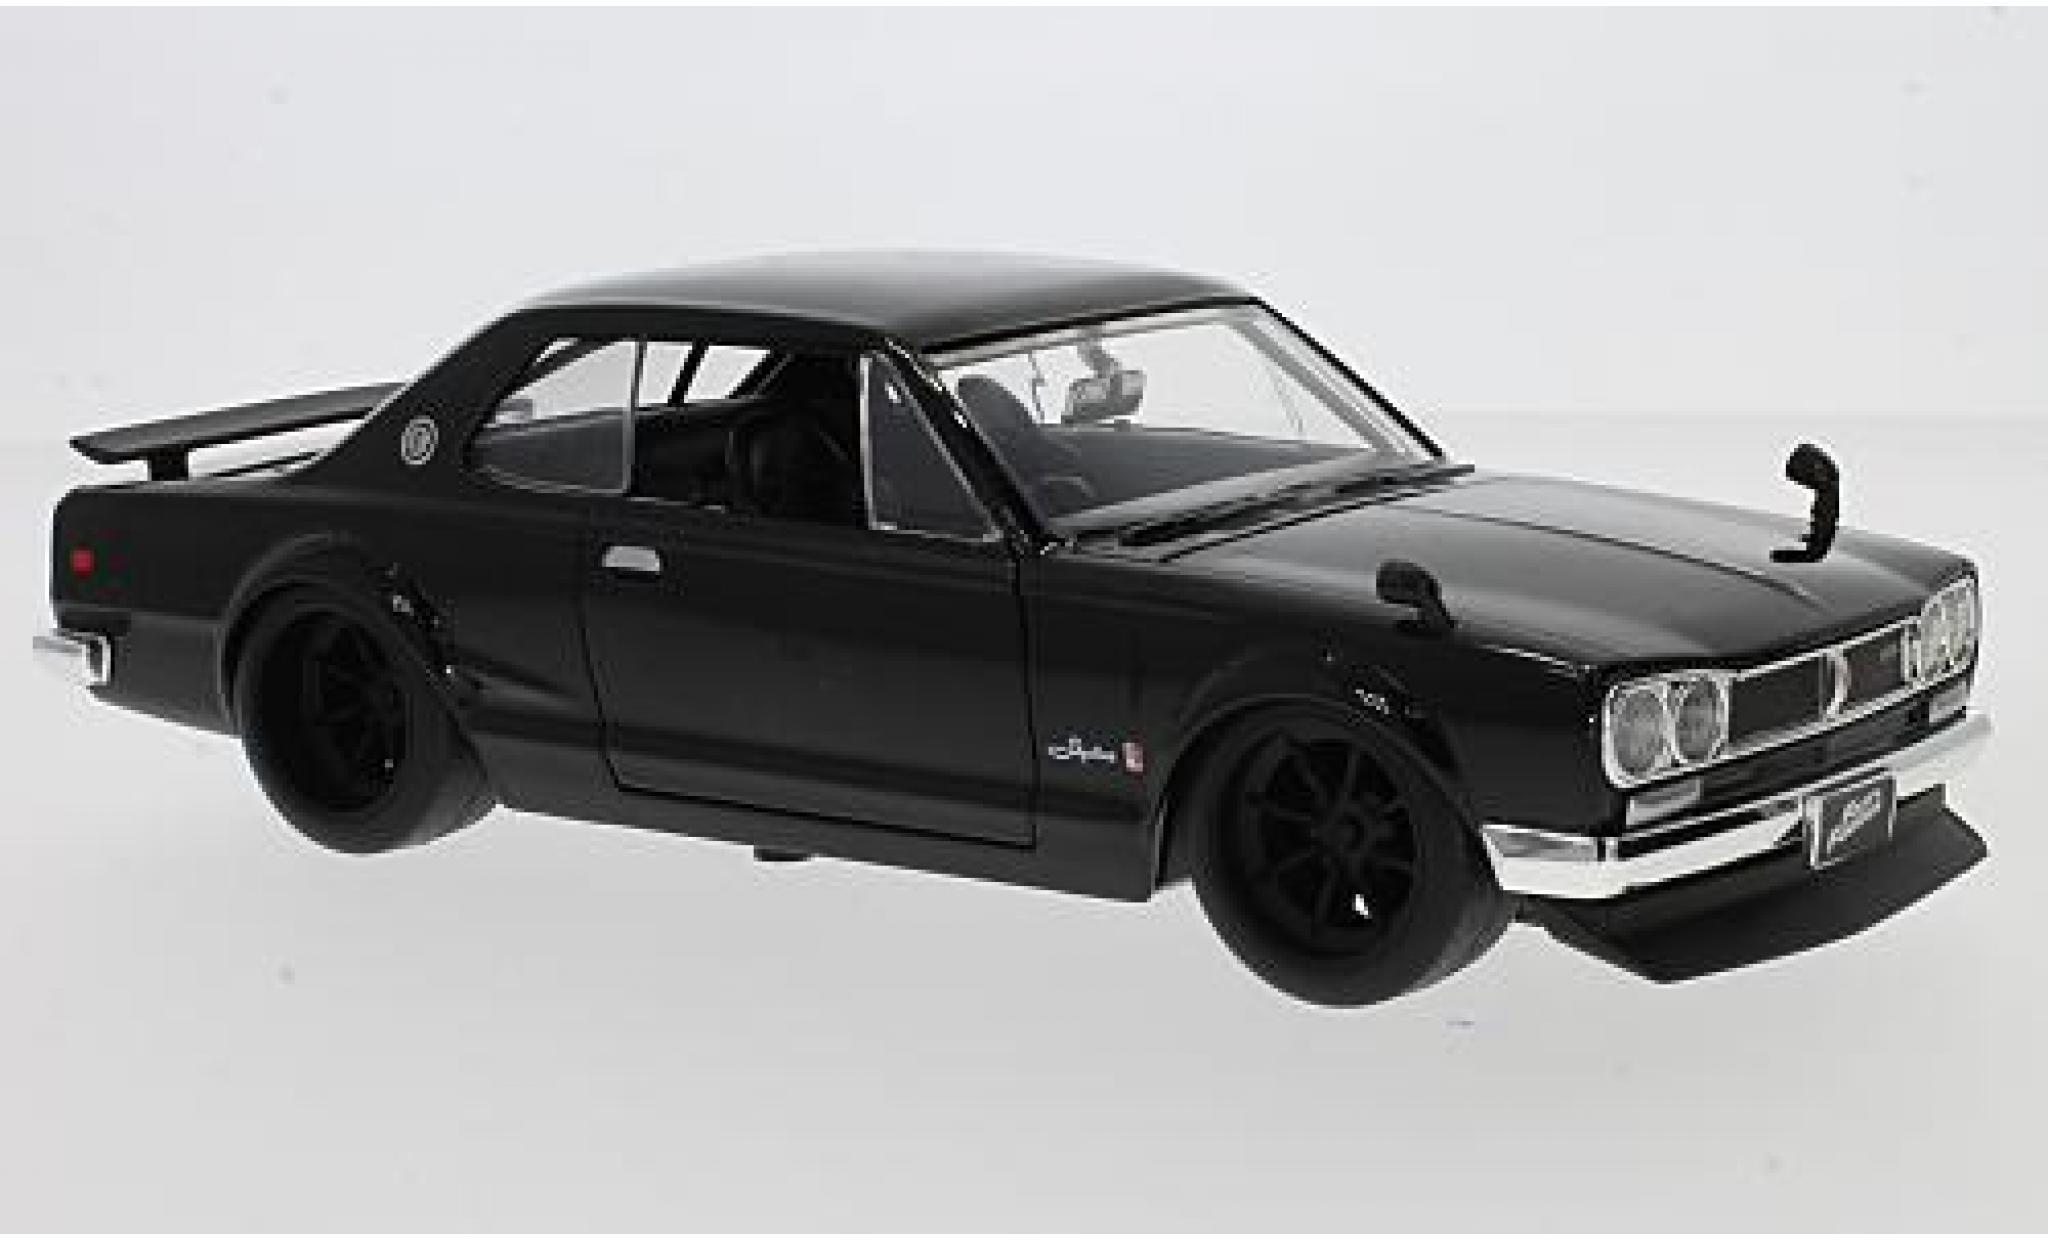 Nissan Skyline 1/24 Jada 2000 GT-R (KPGC10) black RHD Fast & Furious